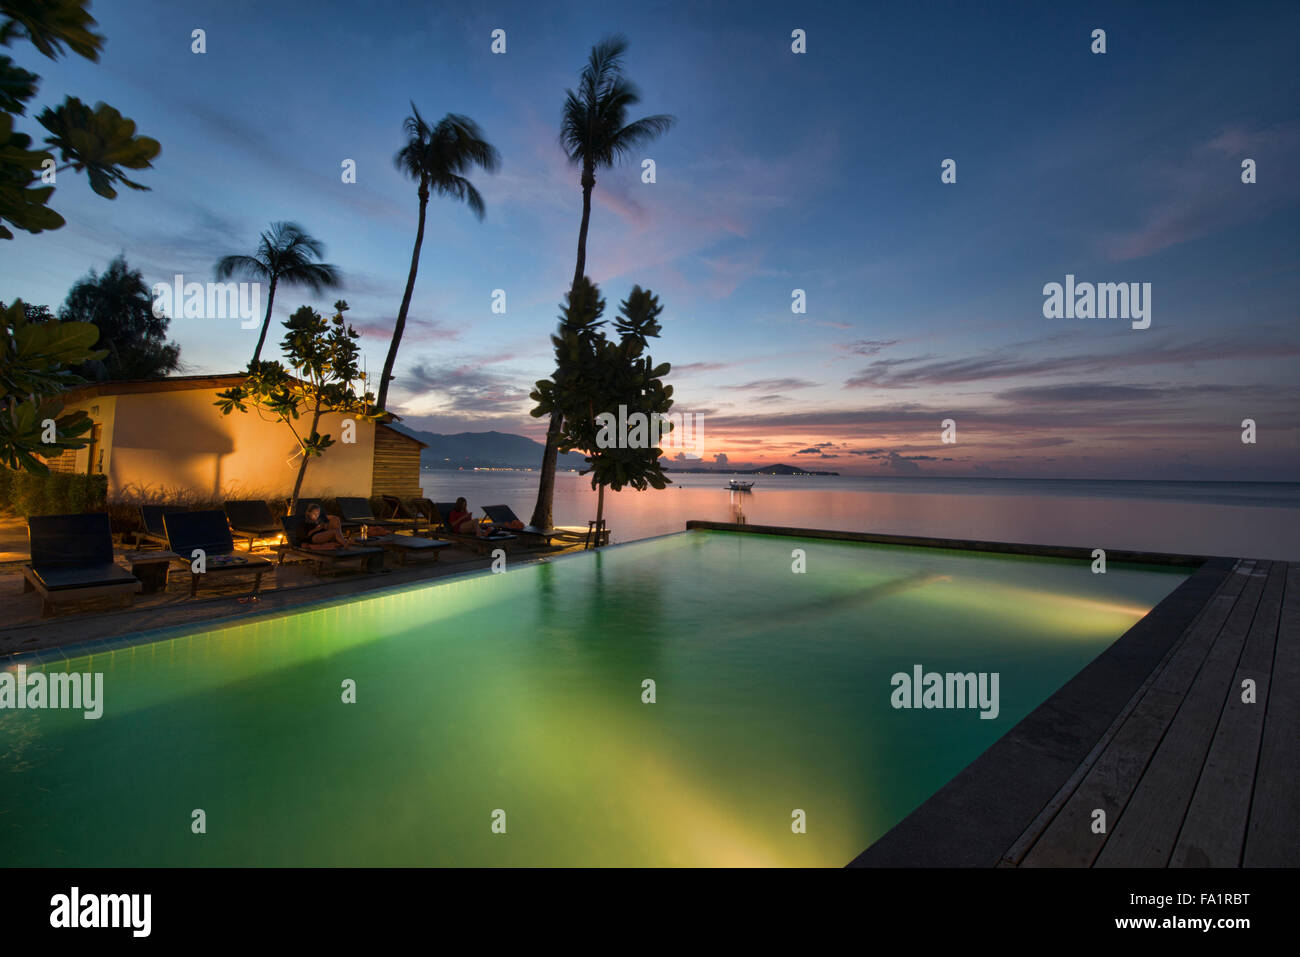 Sunset over an infinity edge pool on Koh Samui island, Thailand - Stock Image